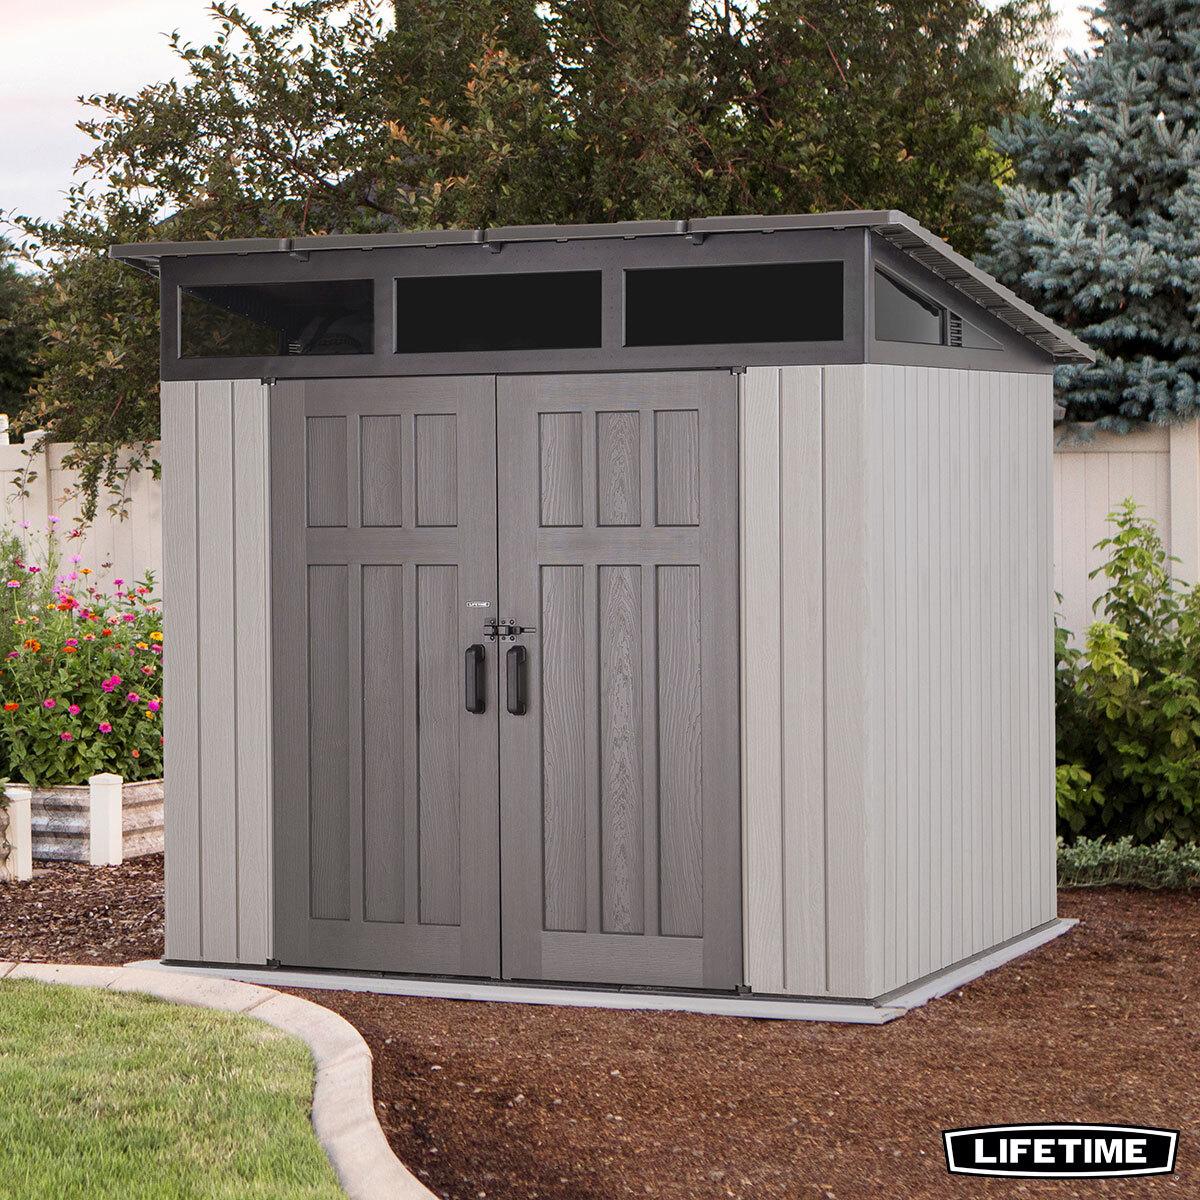 lifetime 8ft 4 x 8ft 4 2 54 x 2 54m studio storage shed costco uk